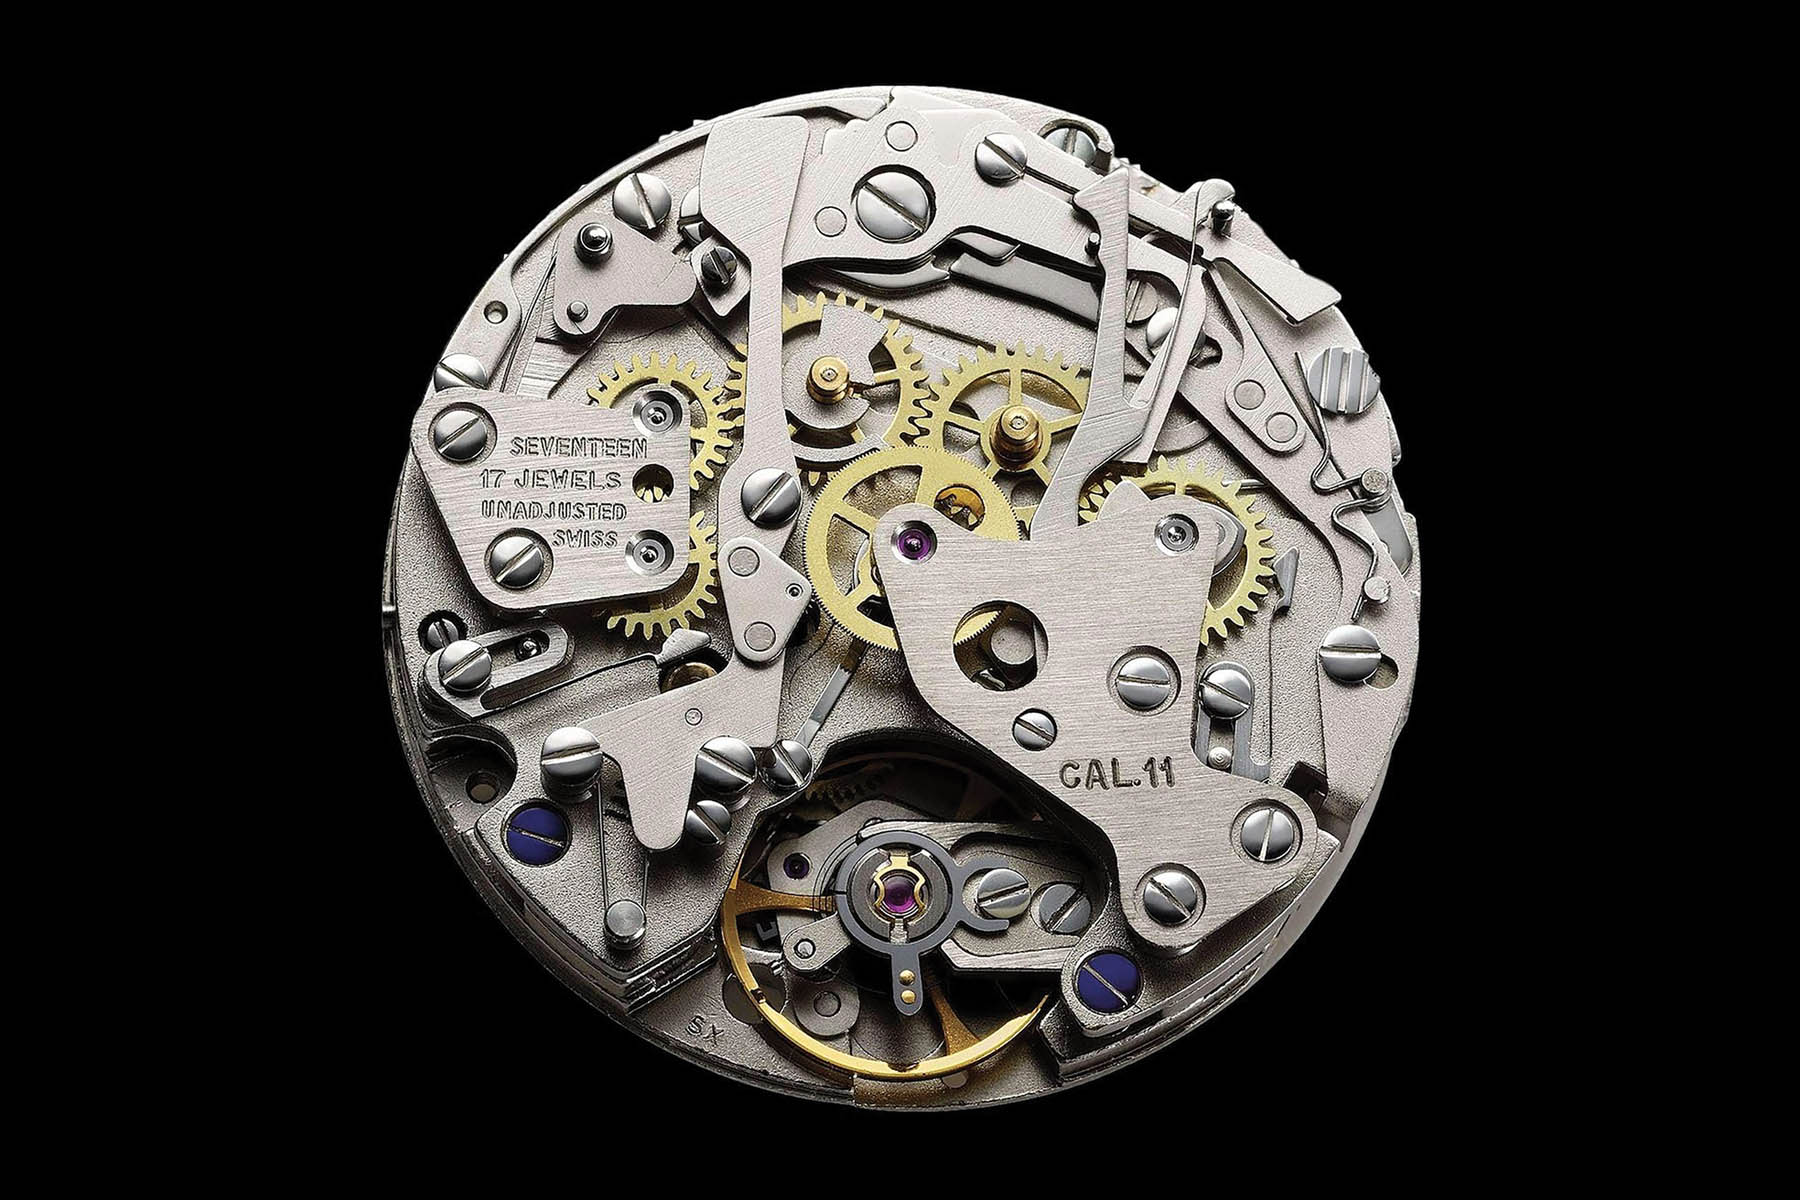 history calibre 11 automatic chronograph 1969